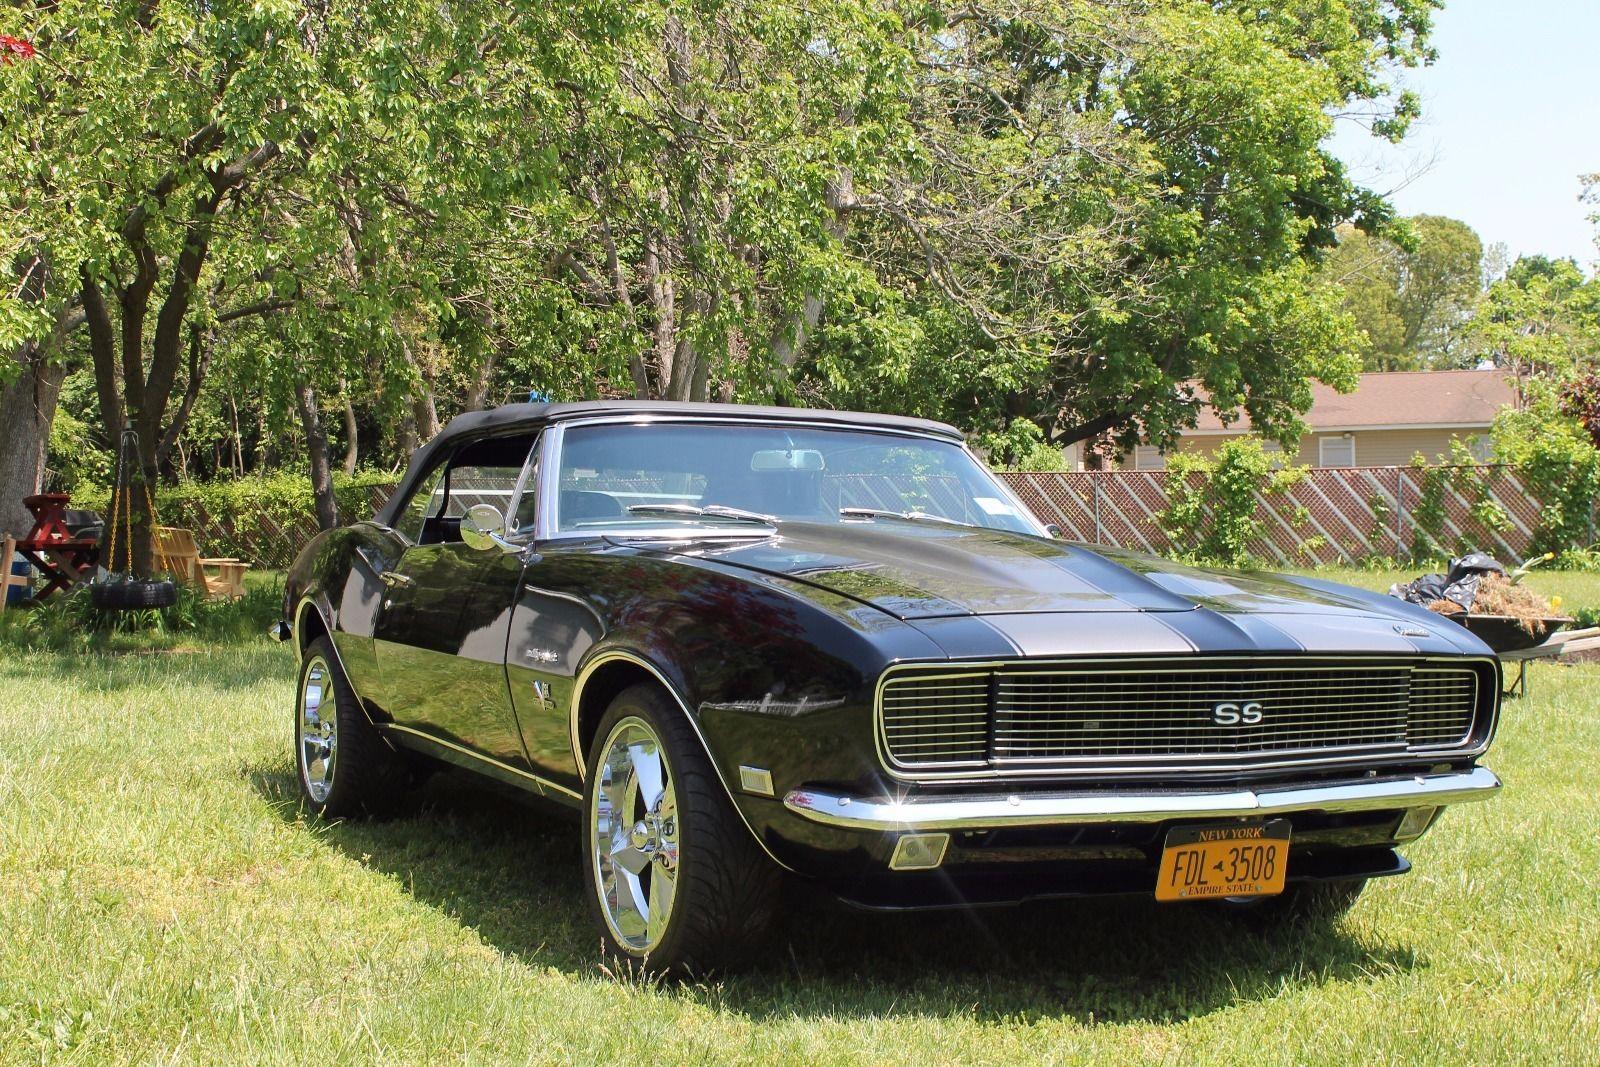 chevrolet camaro ss cabriolet 1967 boss importation de voitures am ricaines. Black Bedroom Furniture Sets. Home Design Ideas